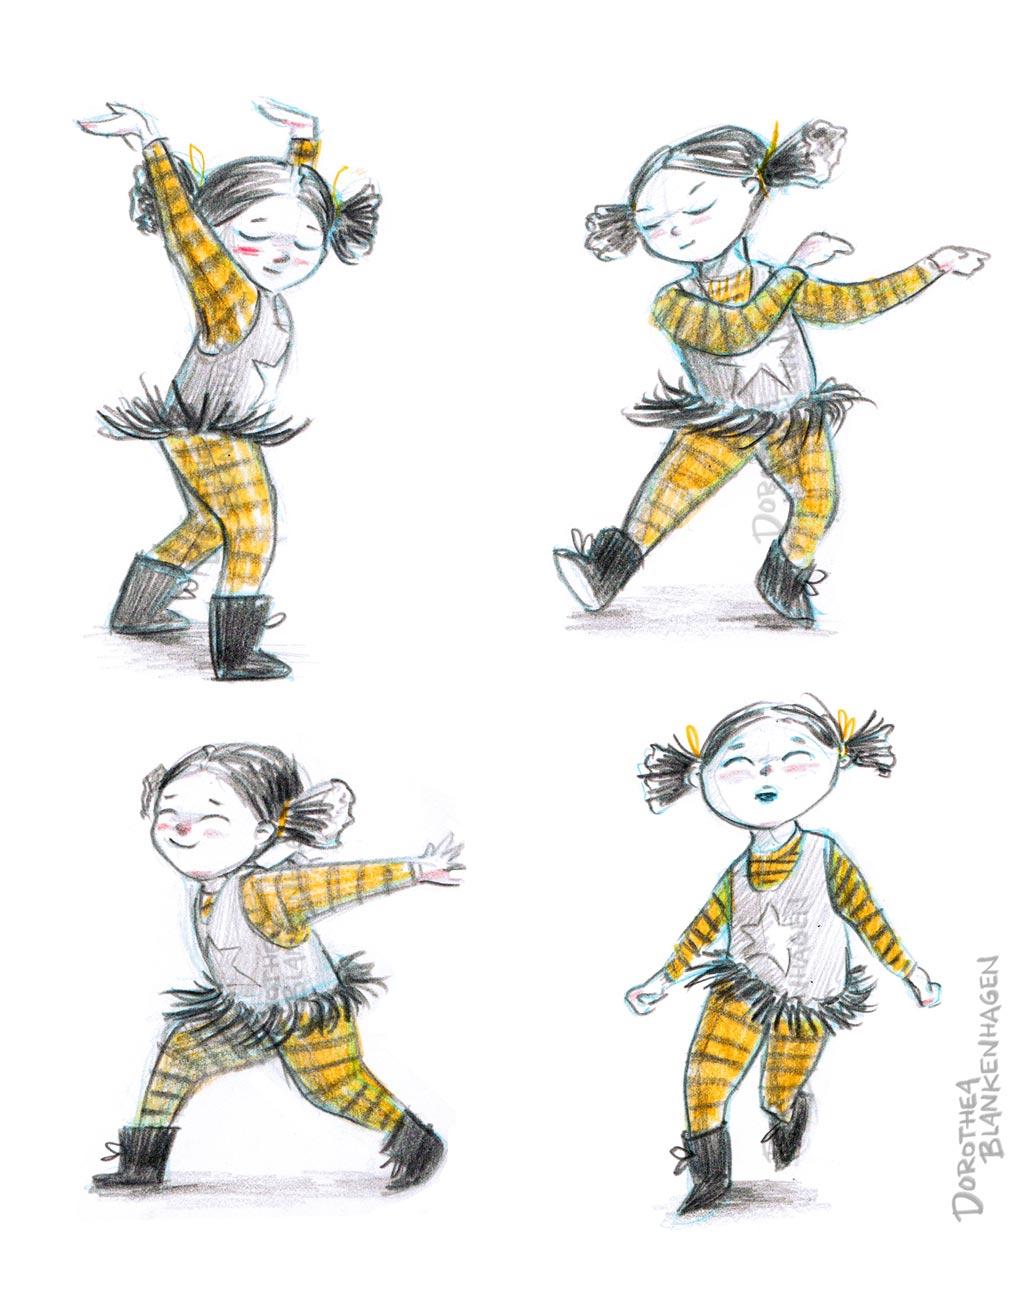 zirkus-little-girl-maedchen-kind-tanz-dance-circus-tale-maerchen-illustration-kidsbook-kinderbuch-dorothea-blankenhagen-berlin.jpg